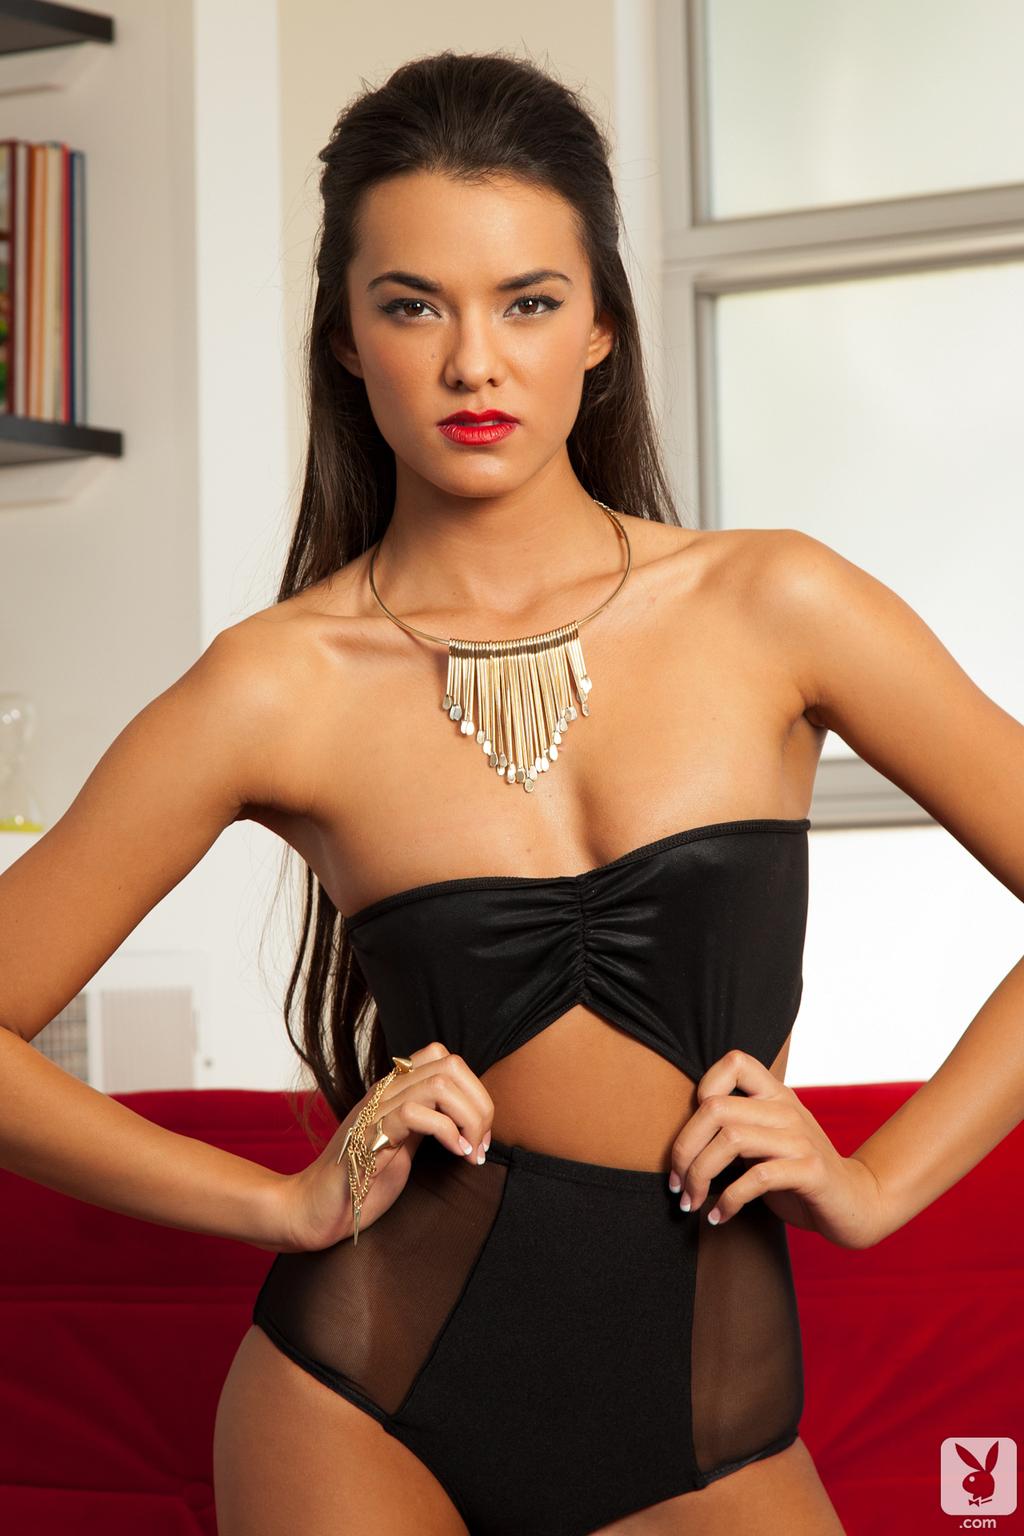 Joanie Brosas Sexy Amateur Playboy Girl 01